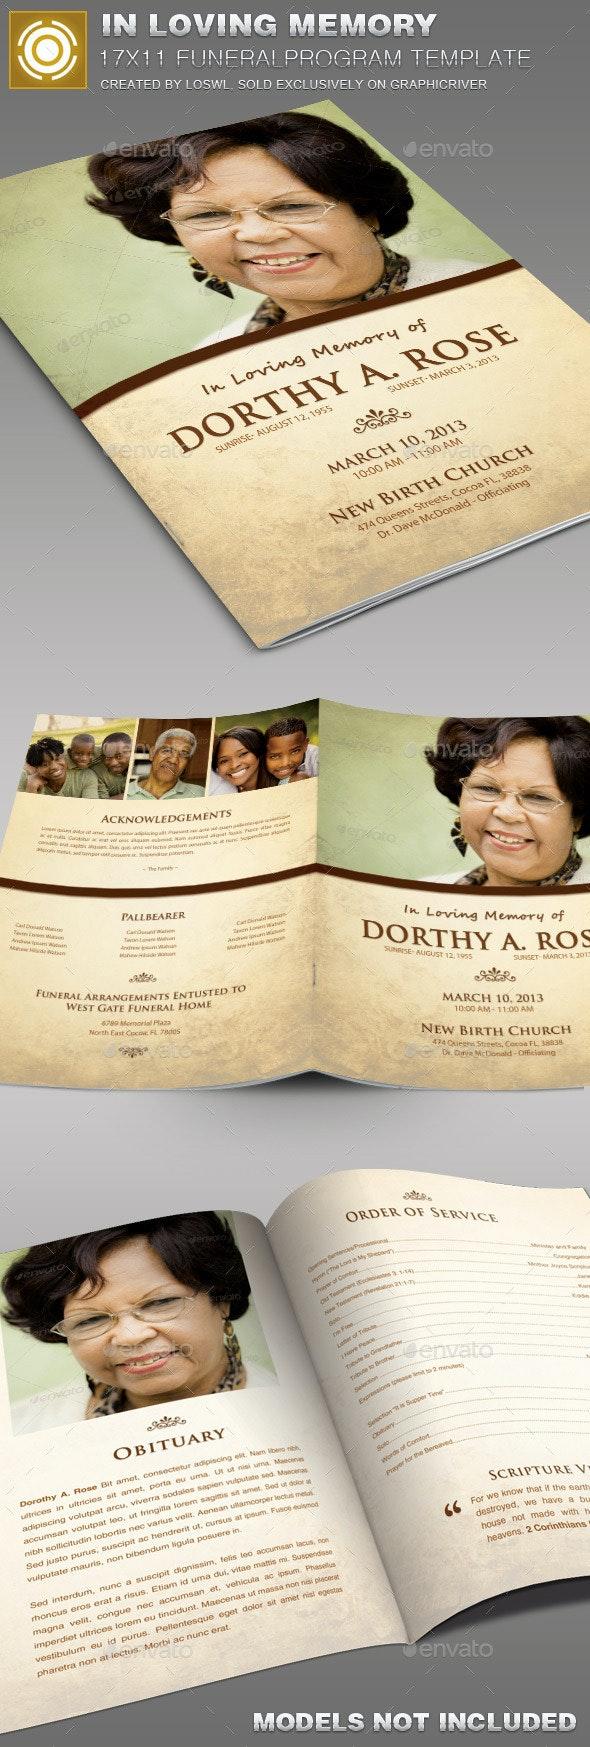 In Loving Memory Funeral Program Template 005 - Informational Brochures